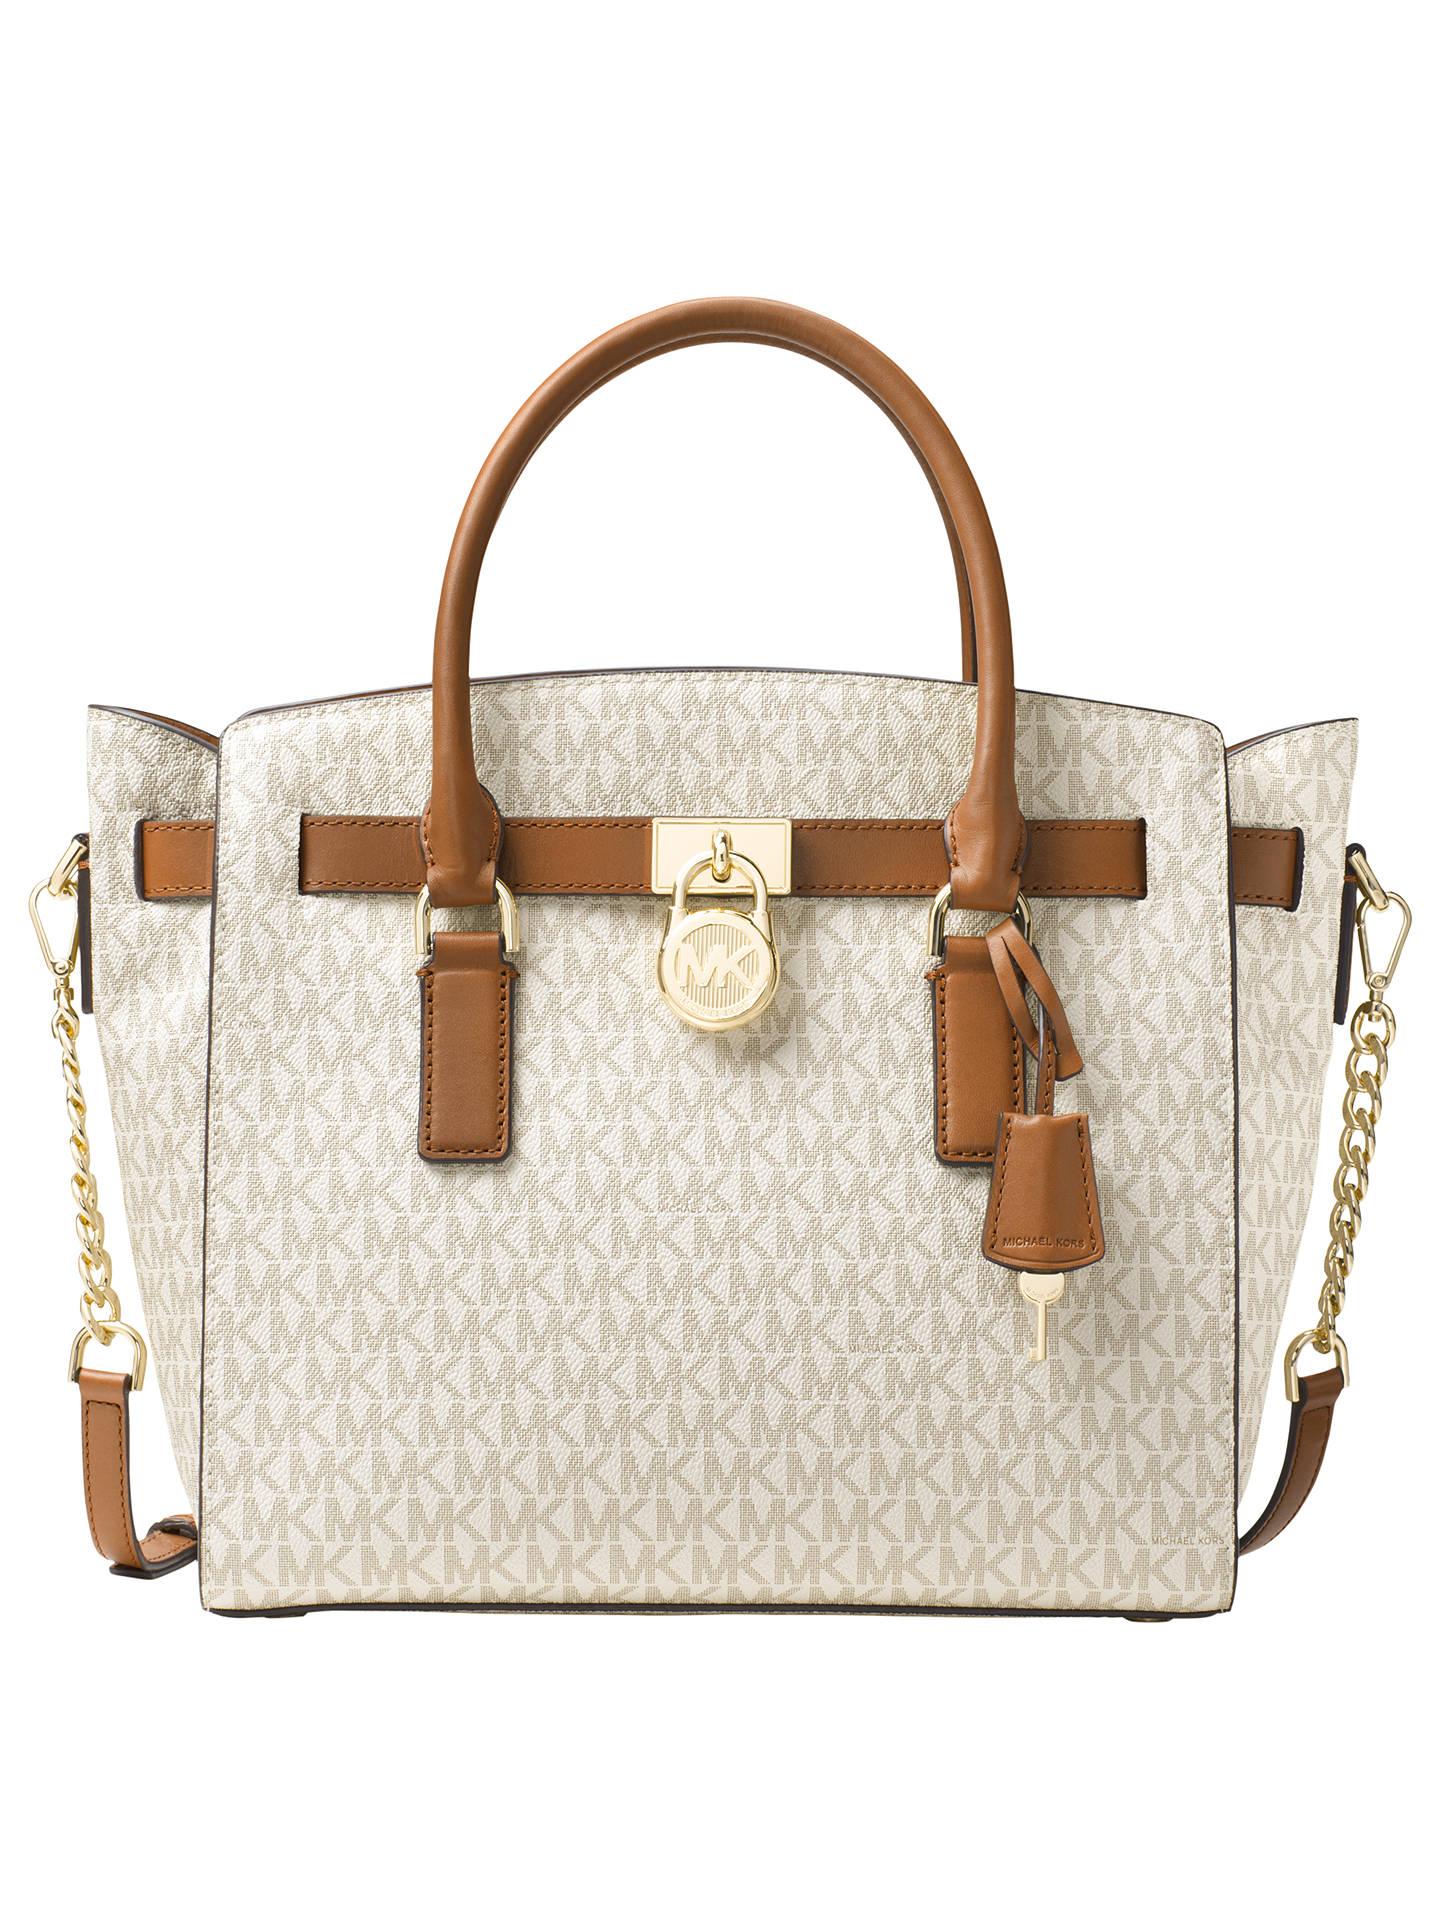 Michael Kors Hamilton Large East West Tote Bag Vanilla Online At Johnlewis